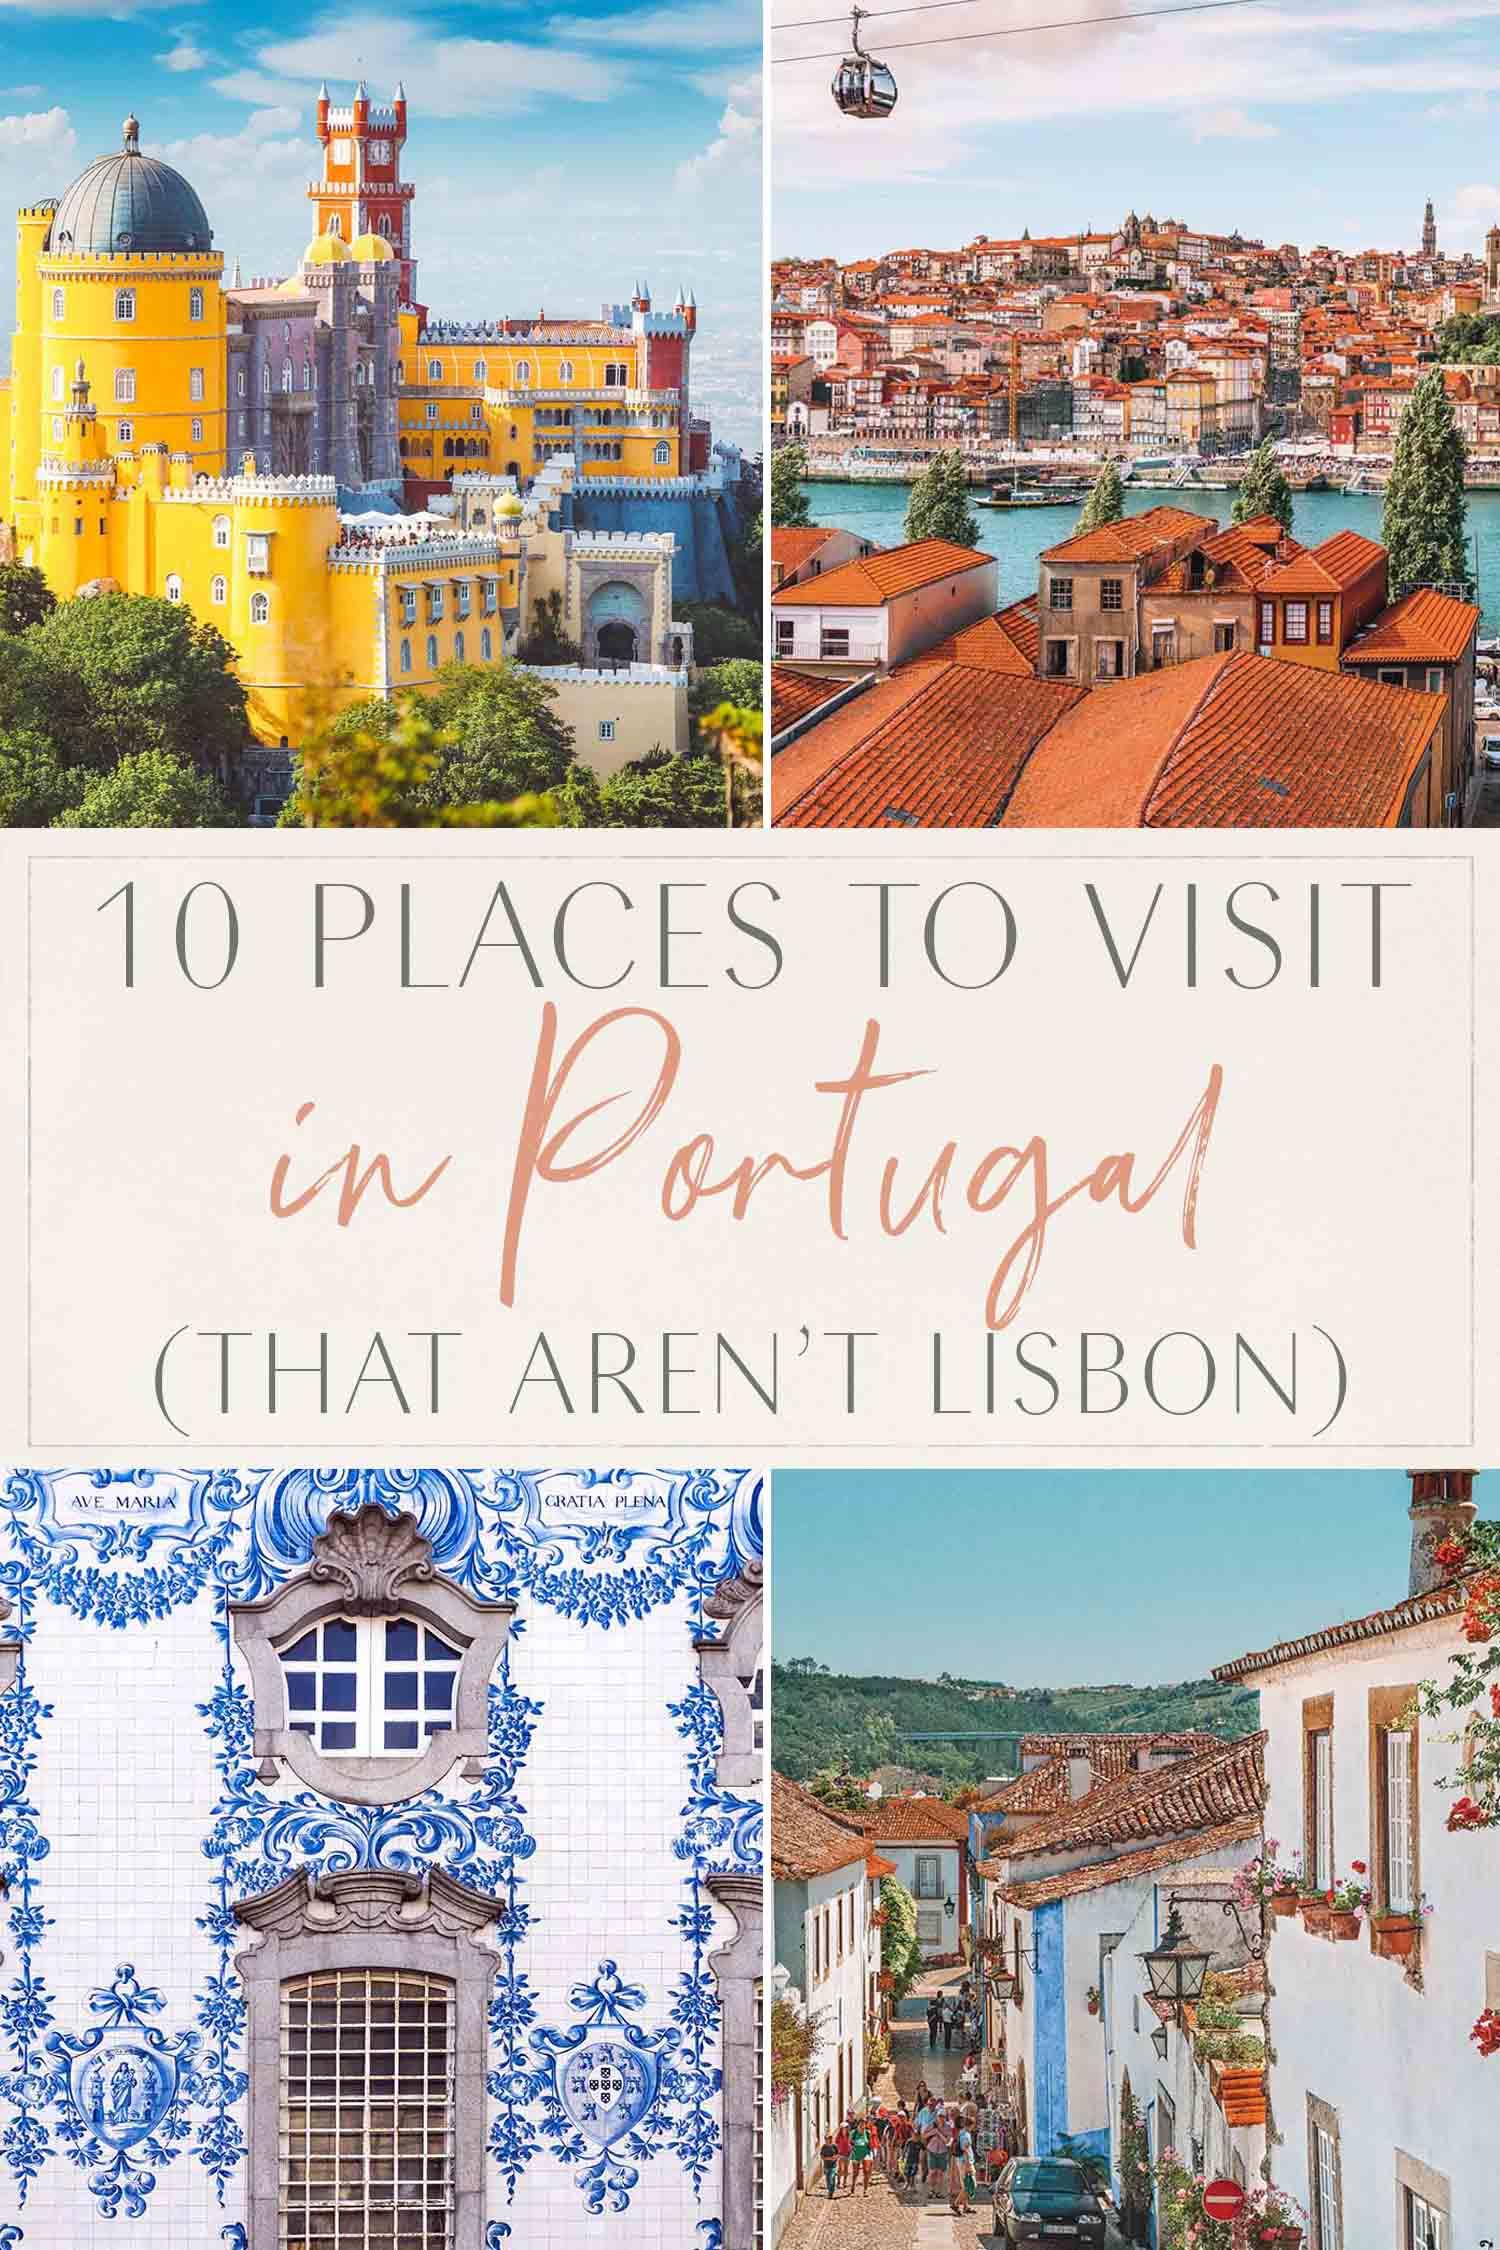 10 places Portugal